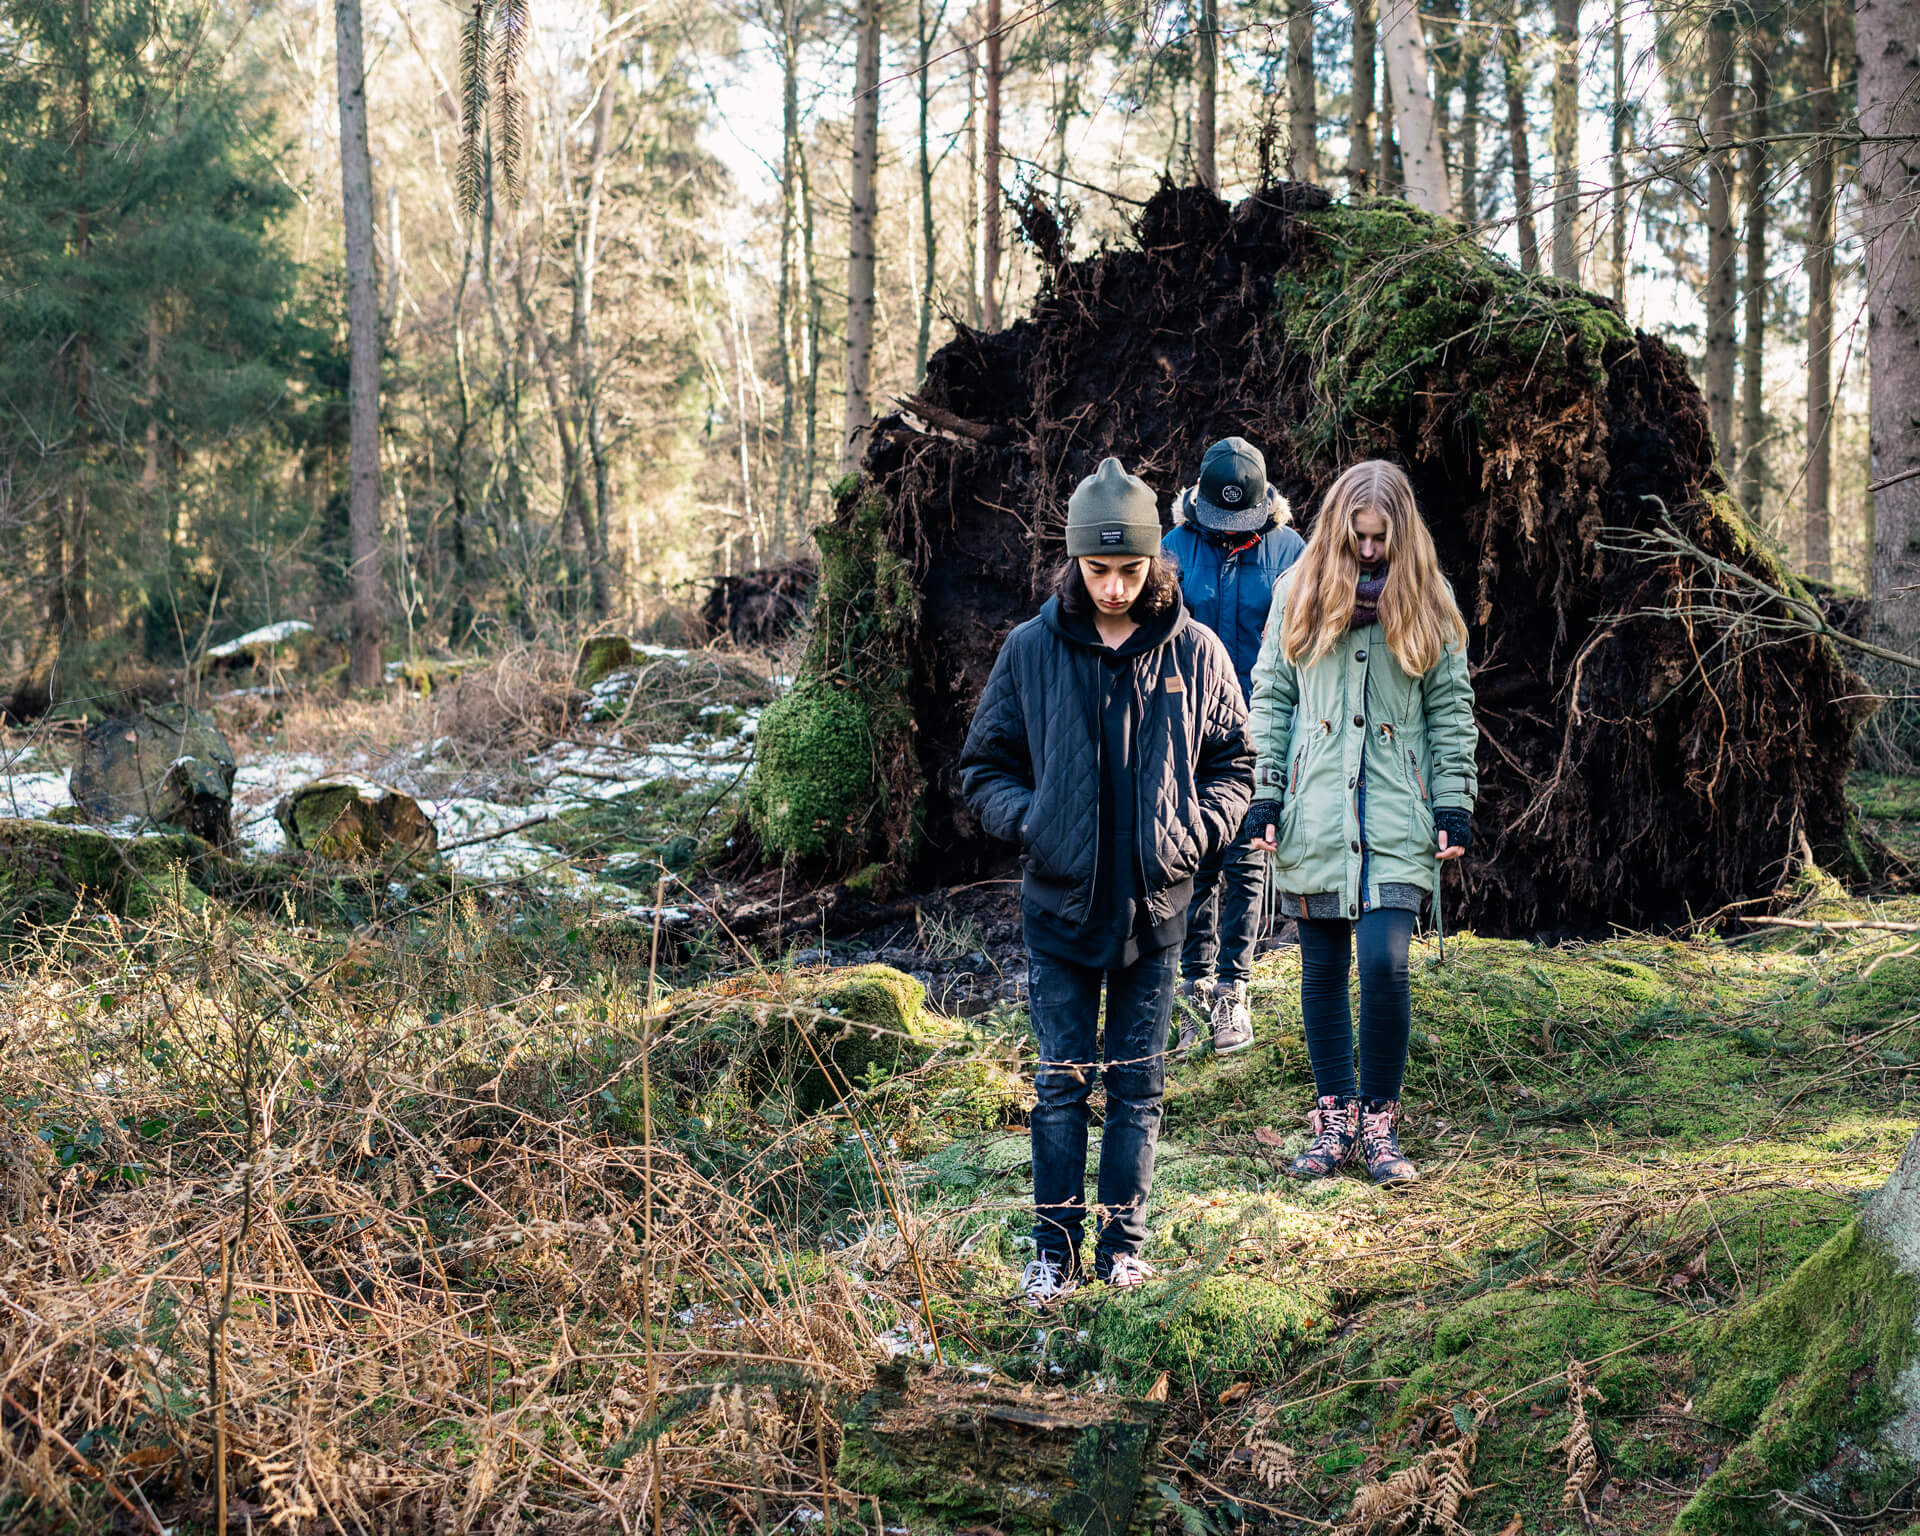 20180218_teens_woodlandwonderland_a_320